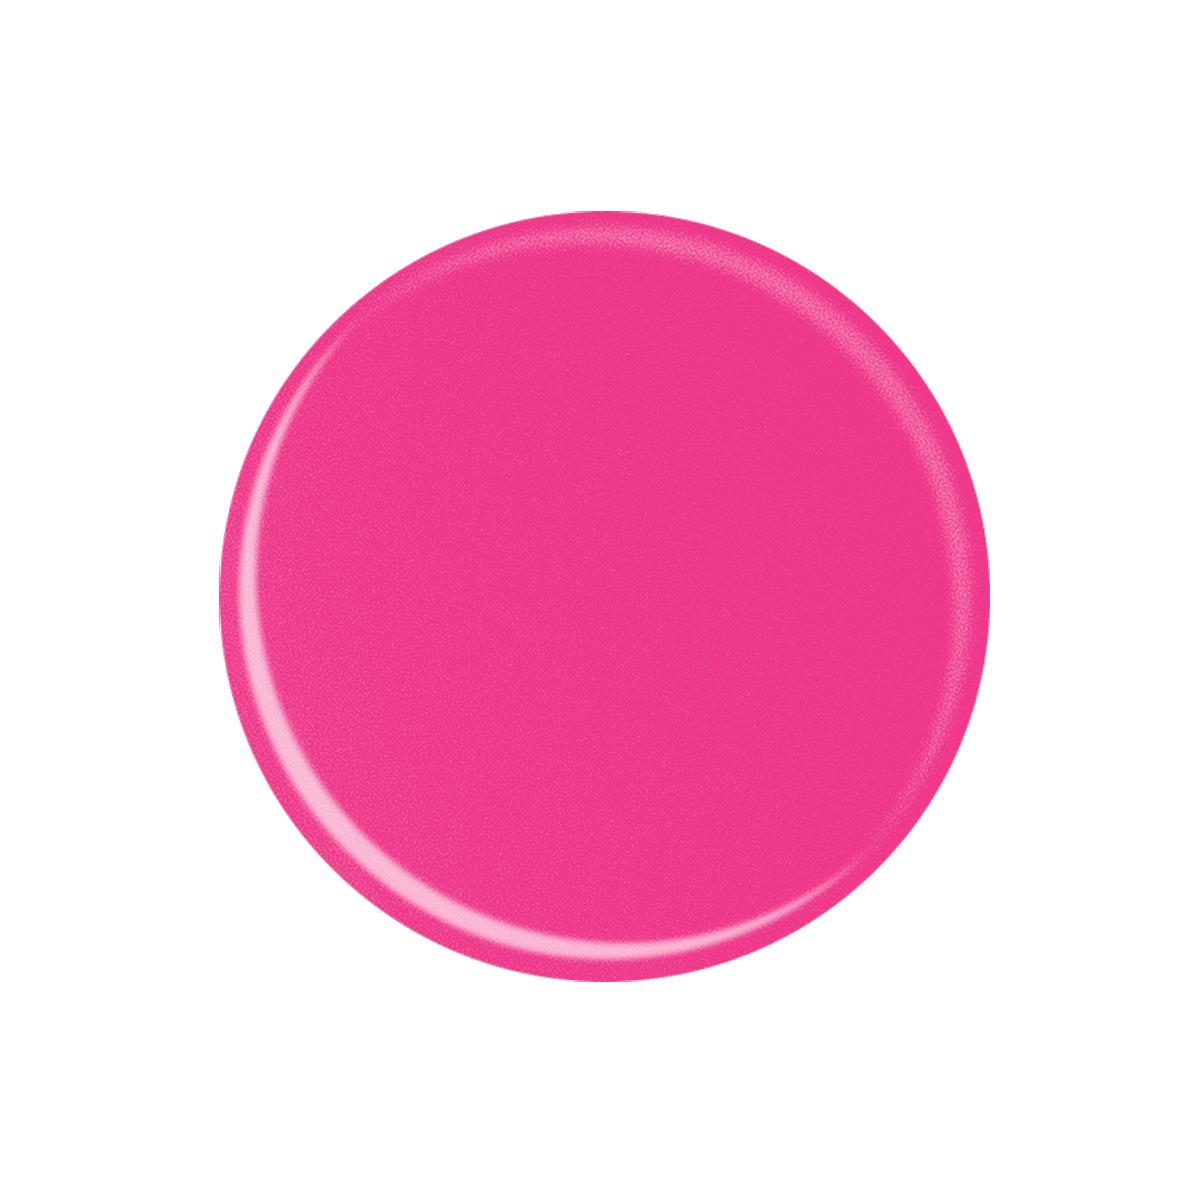 GELeration Pinktastic